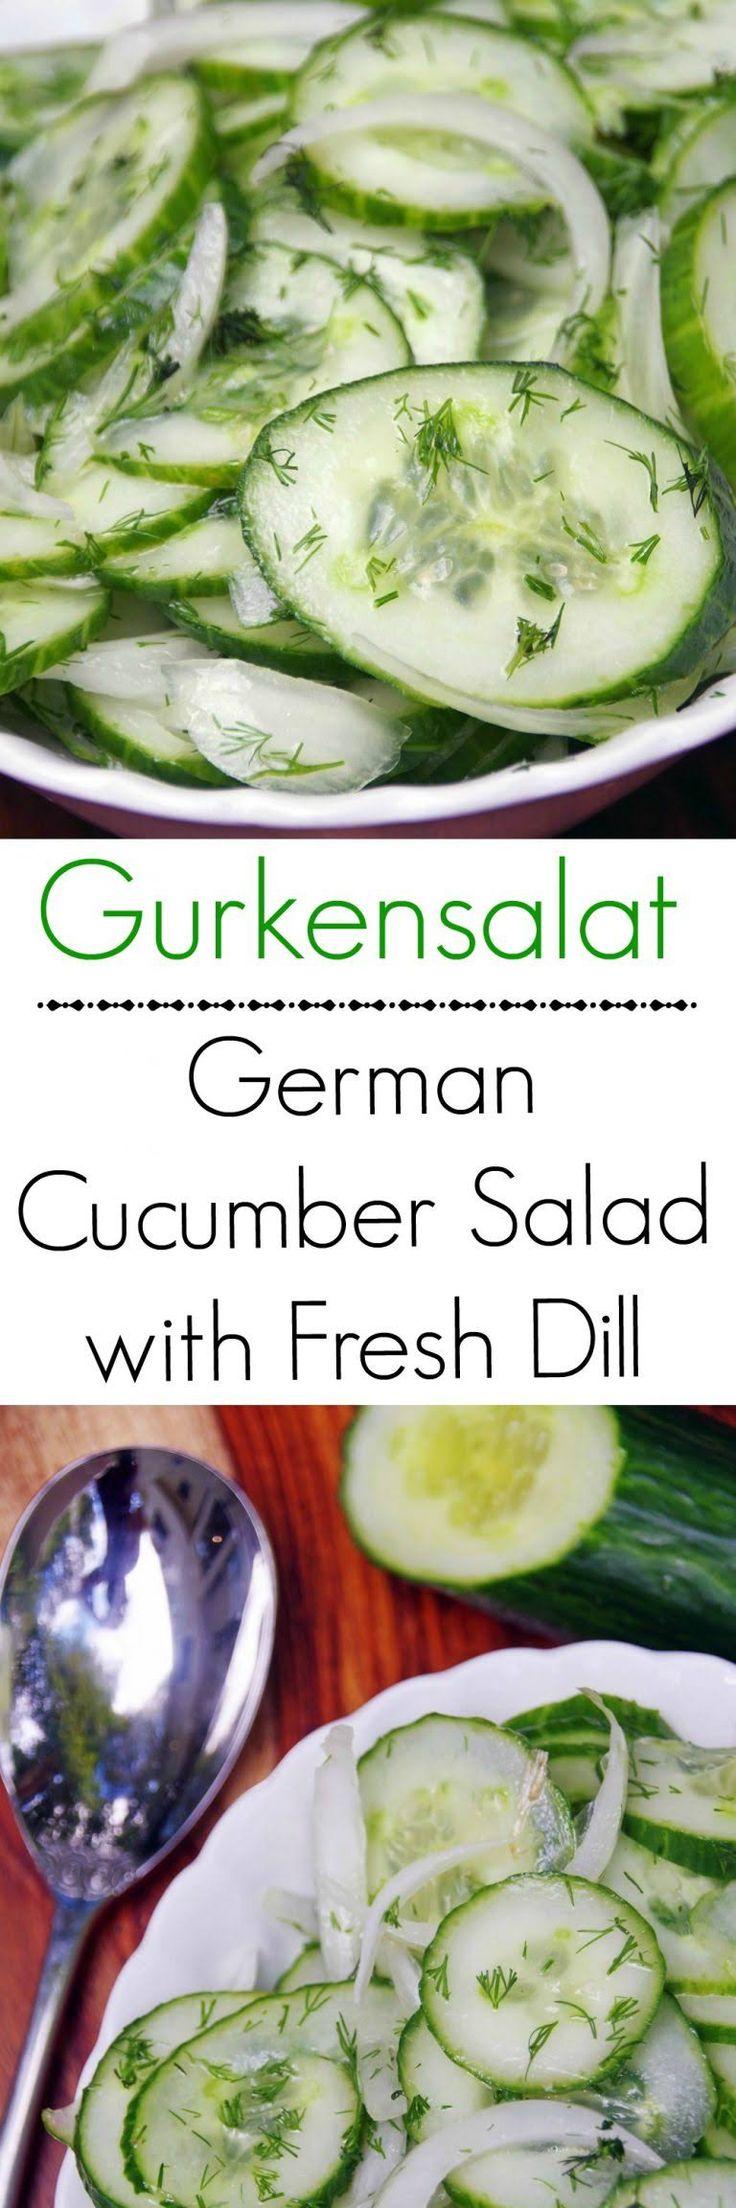 Gurkensalat recipe: A German Cucumber Salad Recipe with Fresh Dill